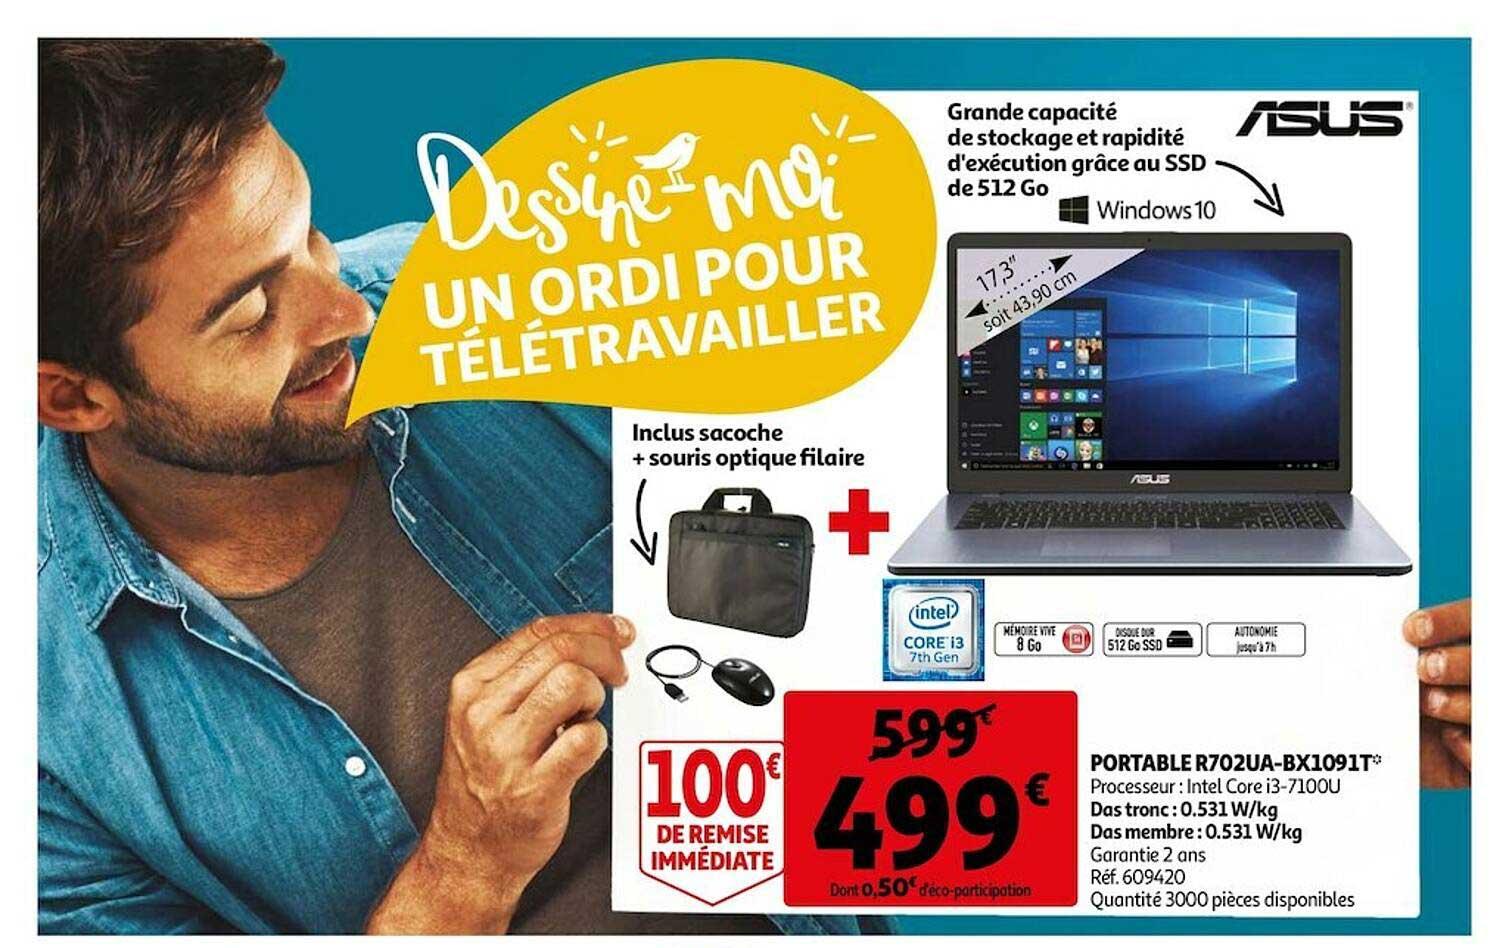 Auchan Portable R702ua-bx1091t Asus